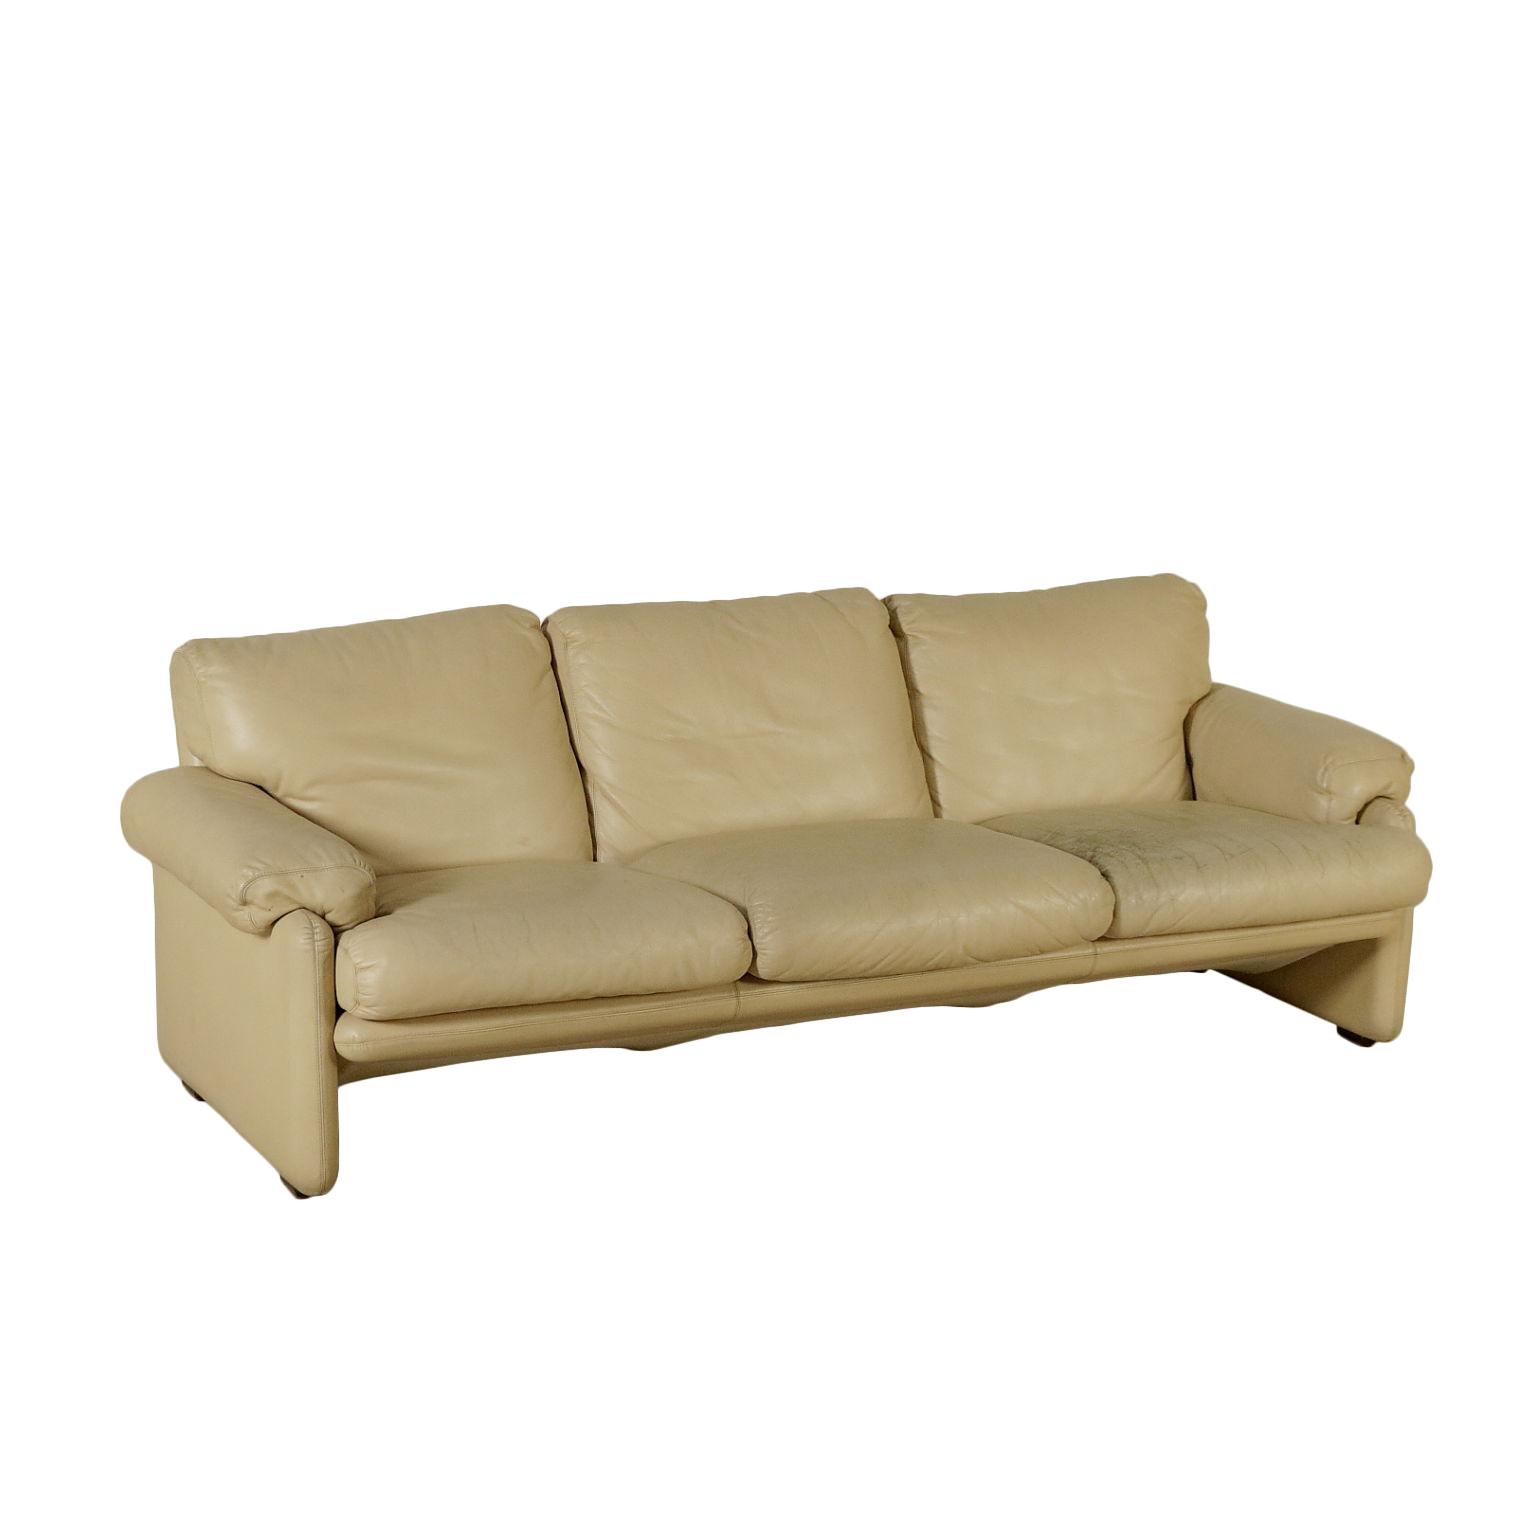 canap coronado ann es 50 canap s design moderne. Black Bedroom Furniture Sets. Home Design Ideas